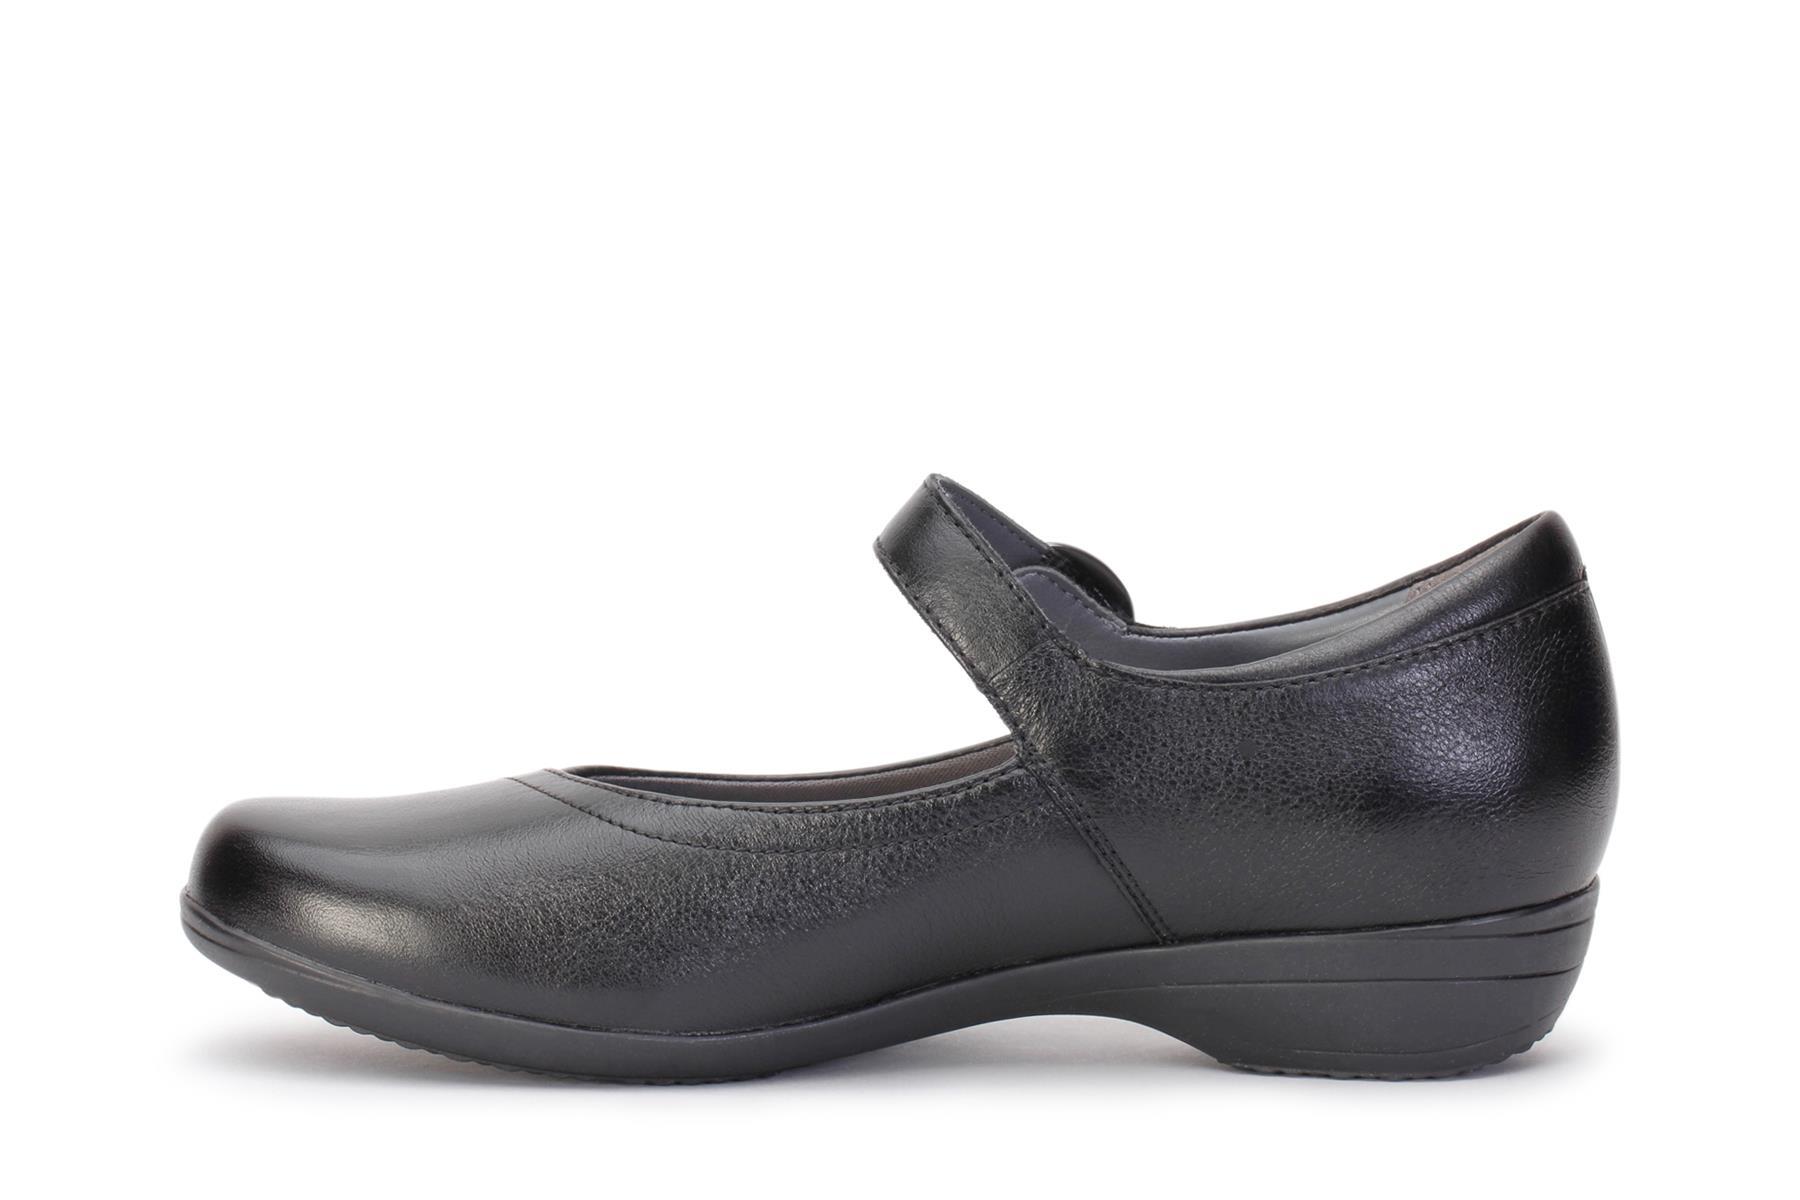 New DANSKO Womens Fawna Black Milled Nappa Leather Mary Jane Shoes 5501020200